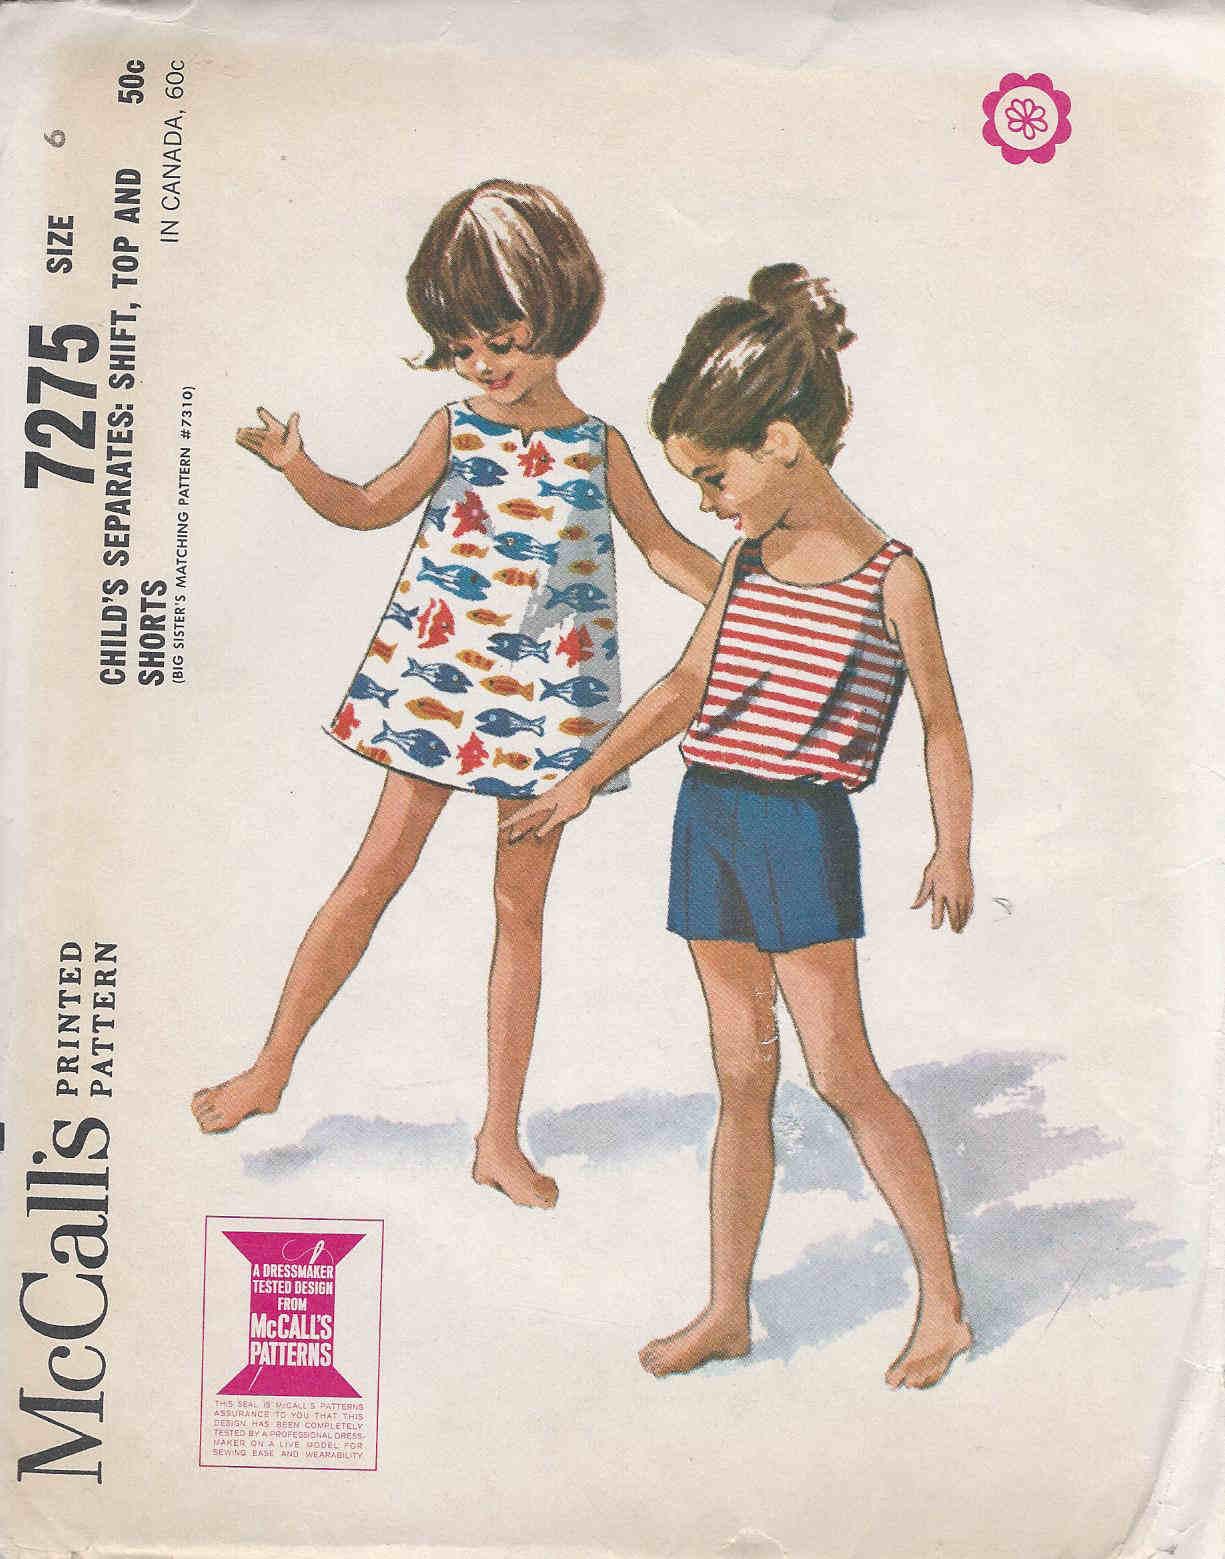 McCall's 7275